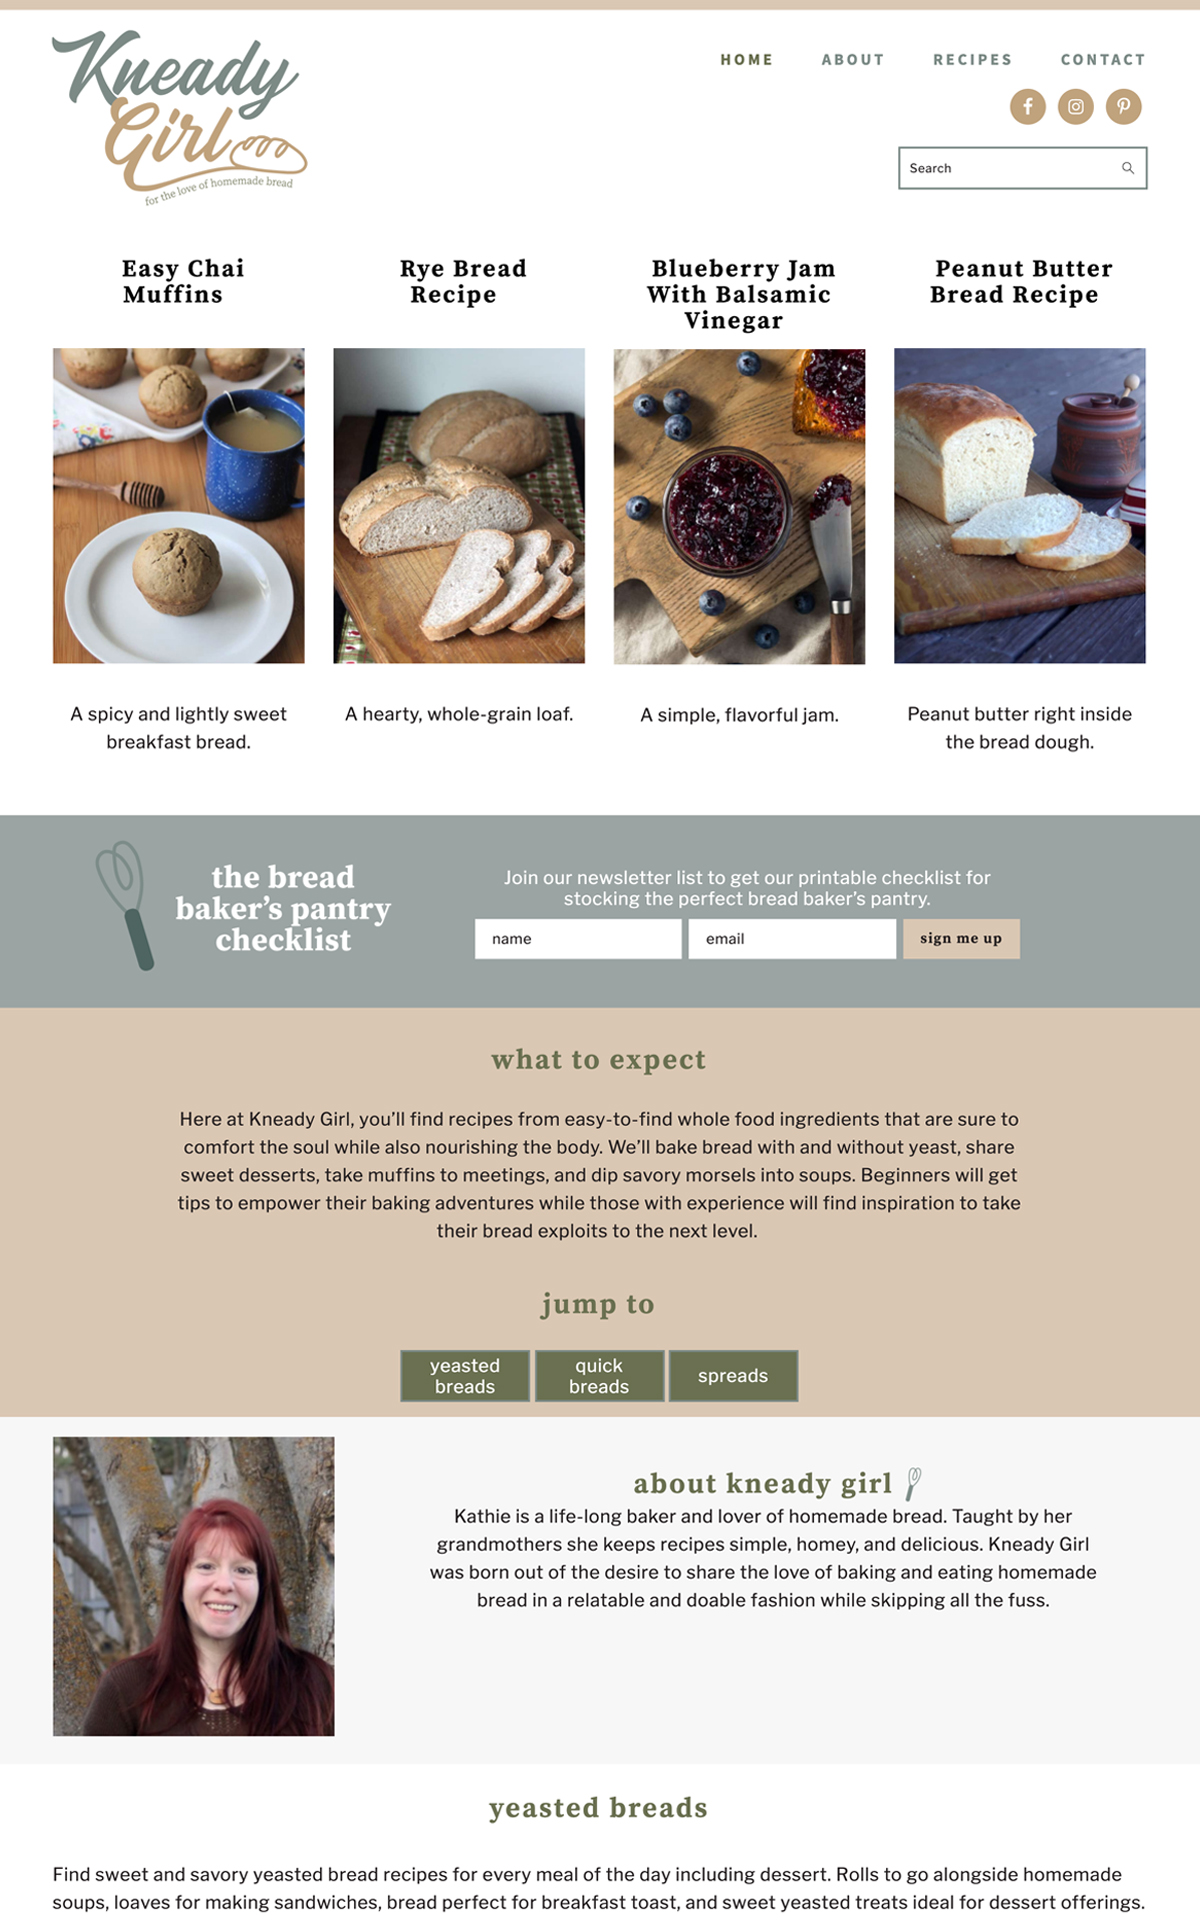 Kneady-Girl-Web-Design-Food-Bloggers